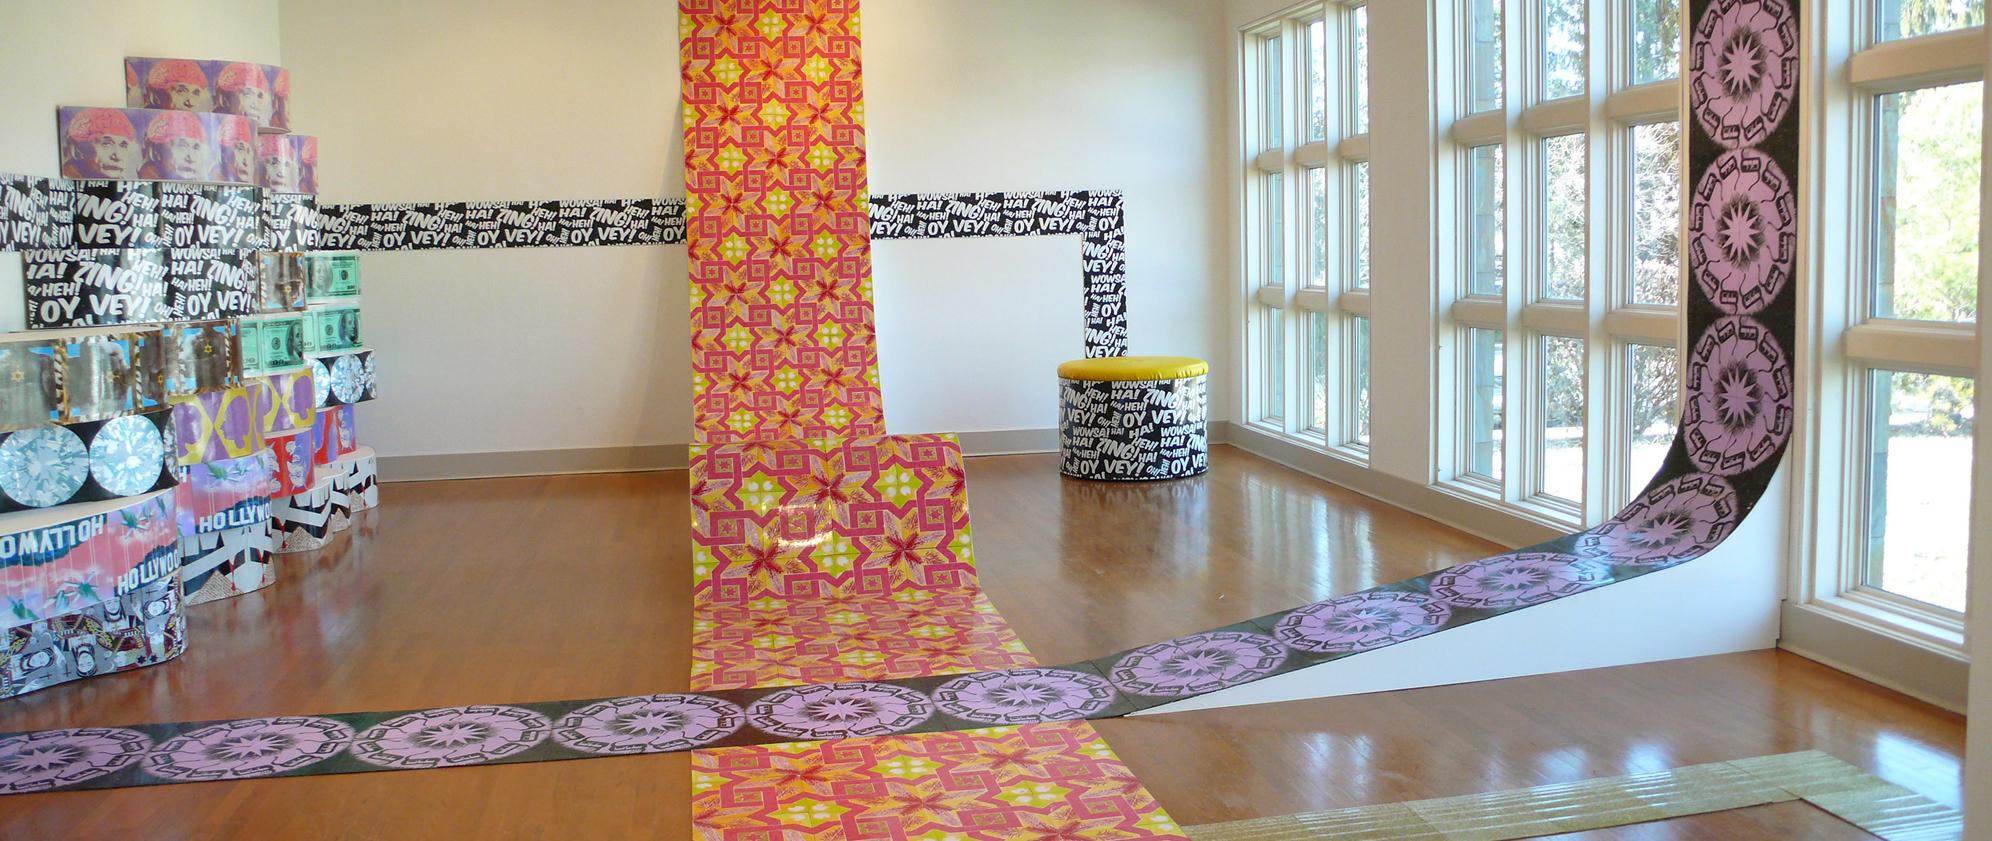 Urban Pop curated by Amie Potsic, artwork by Leslie Friedman